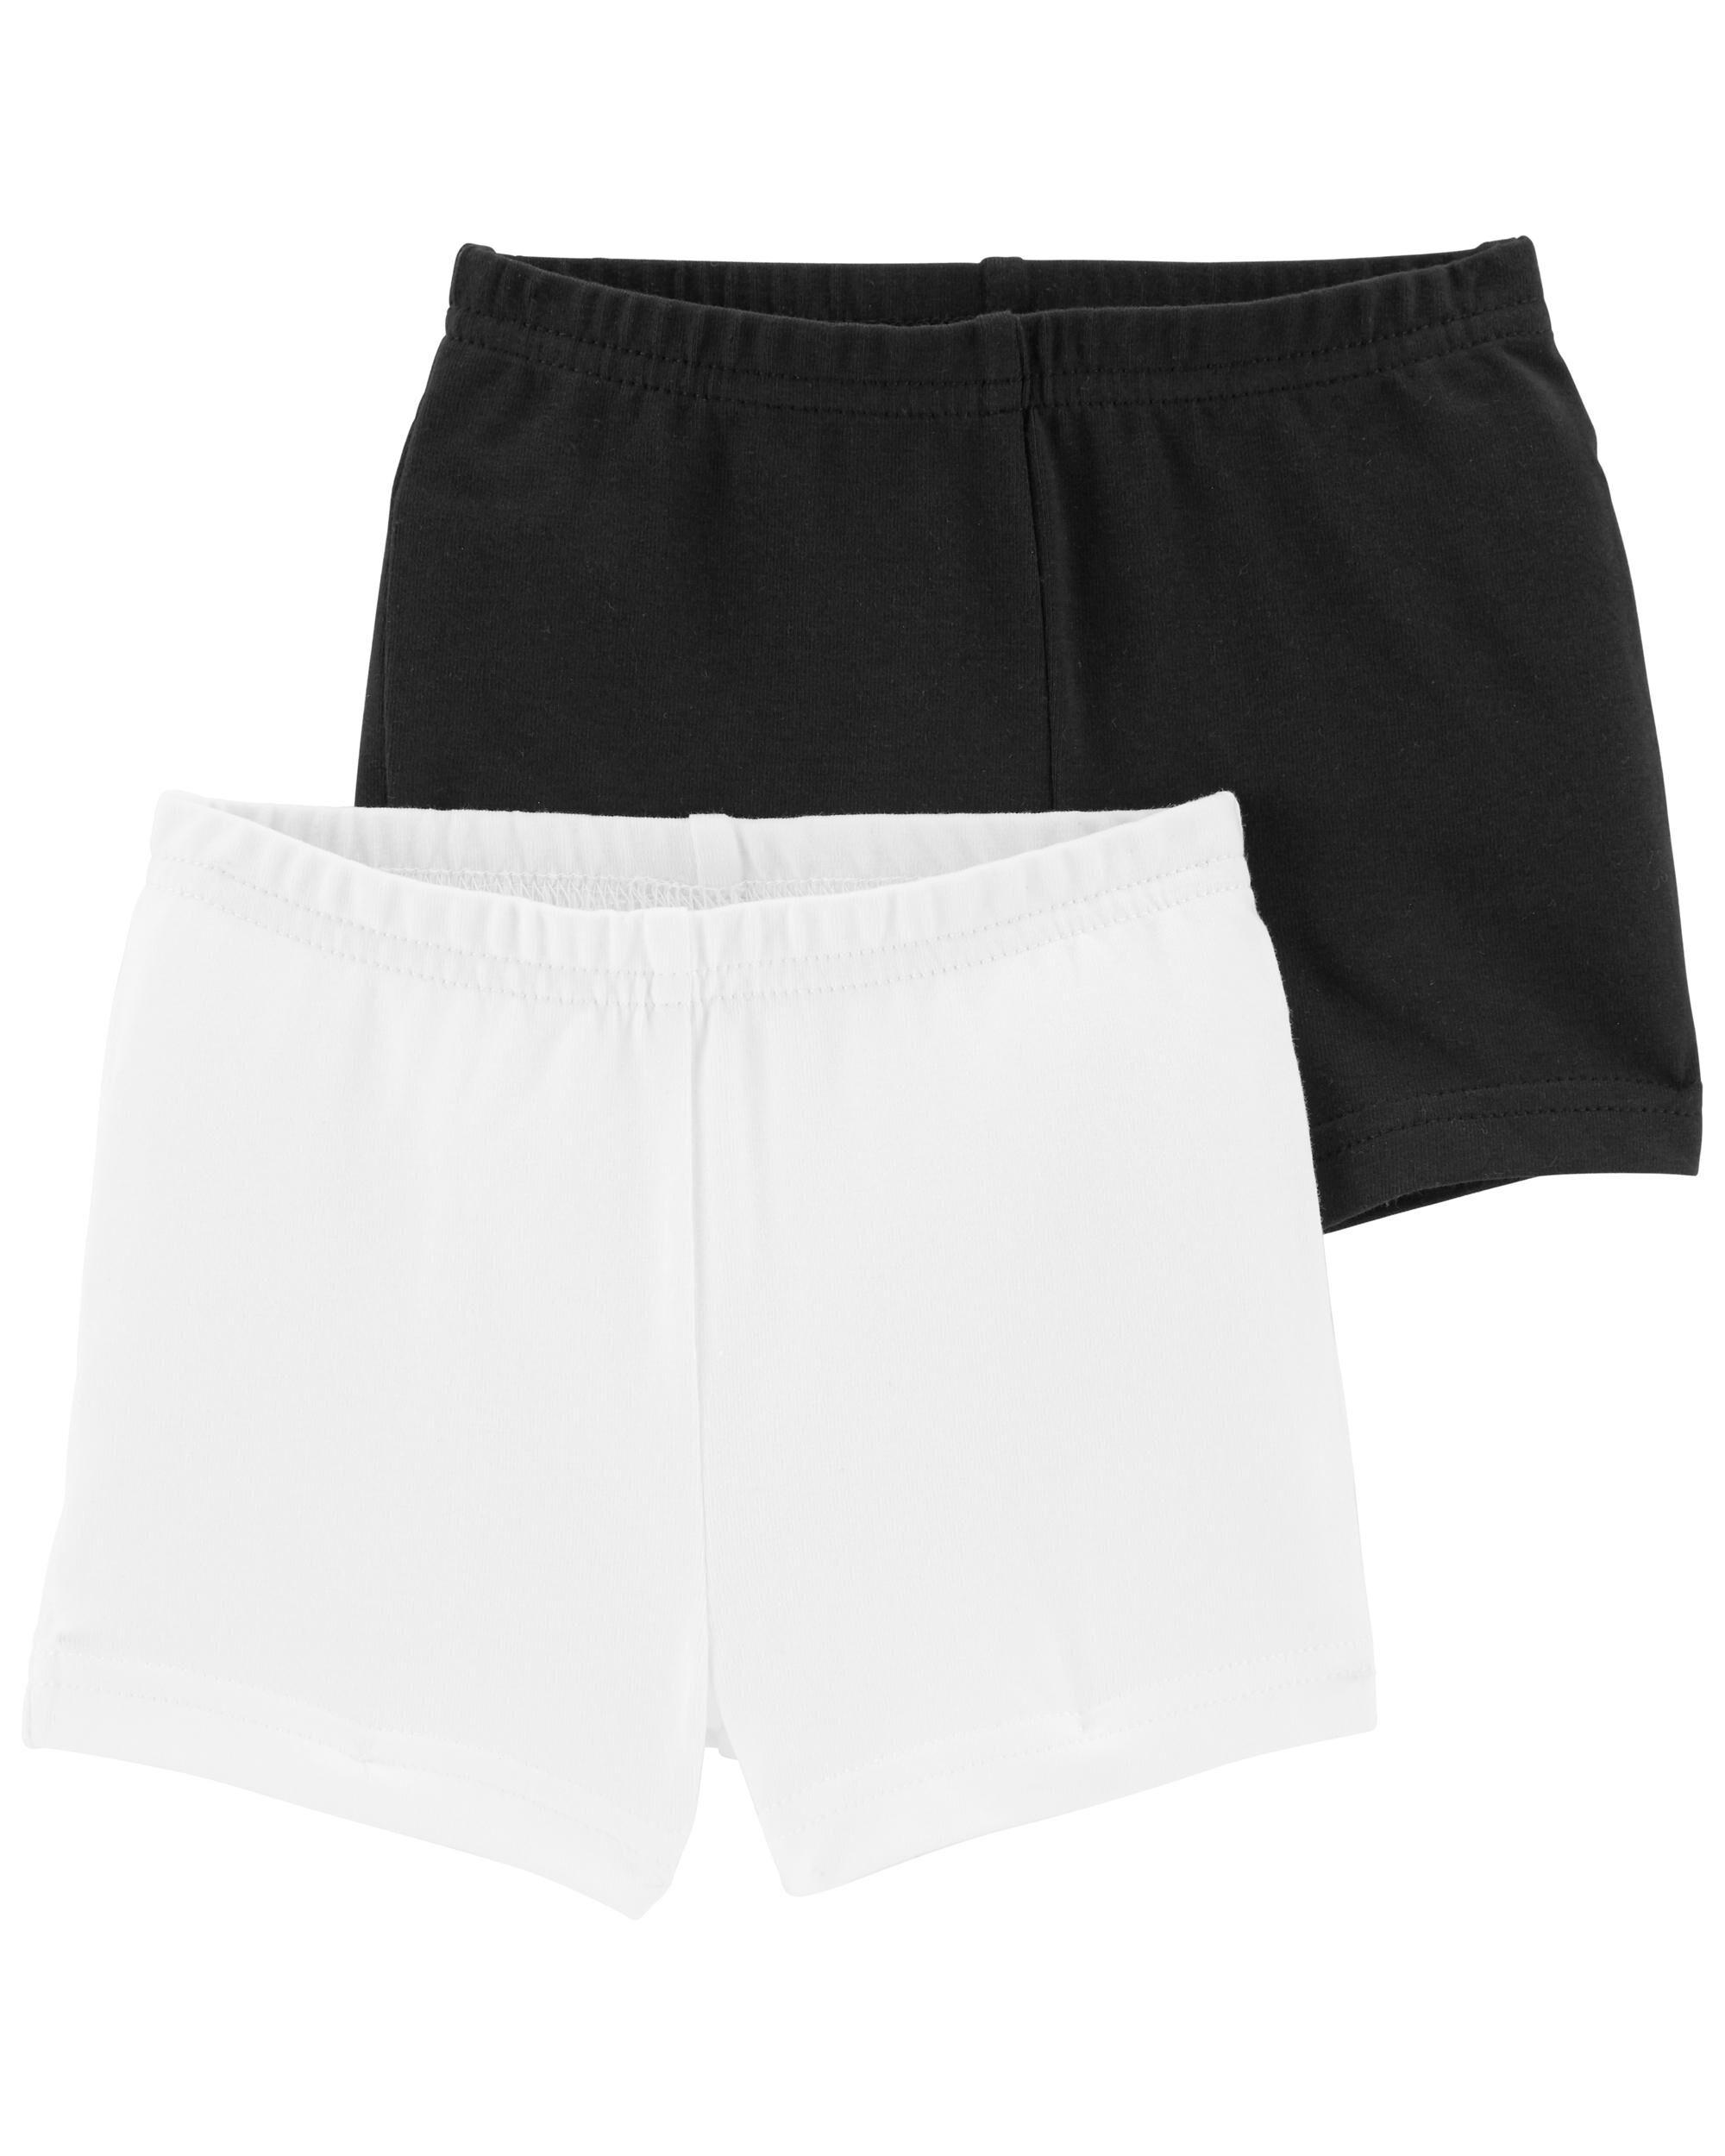 Carters 2-Pack Tumbling Shorts